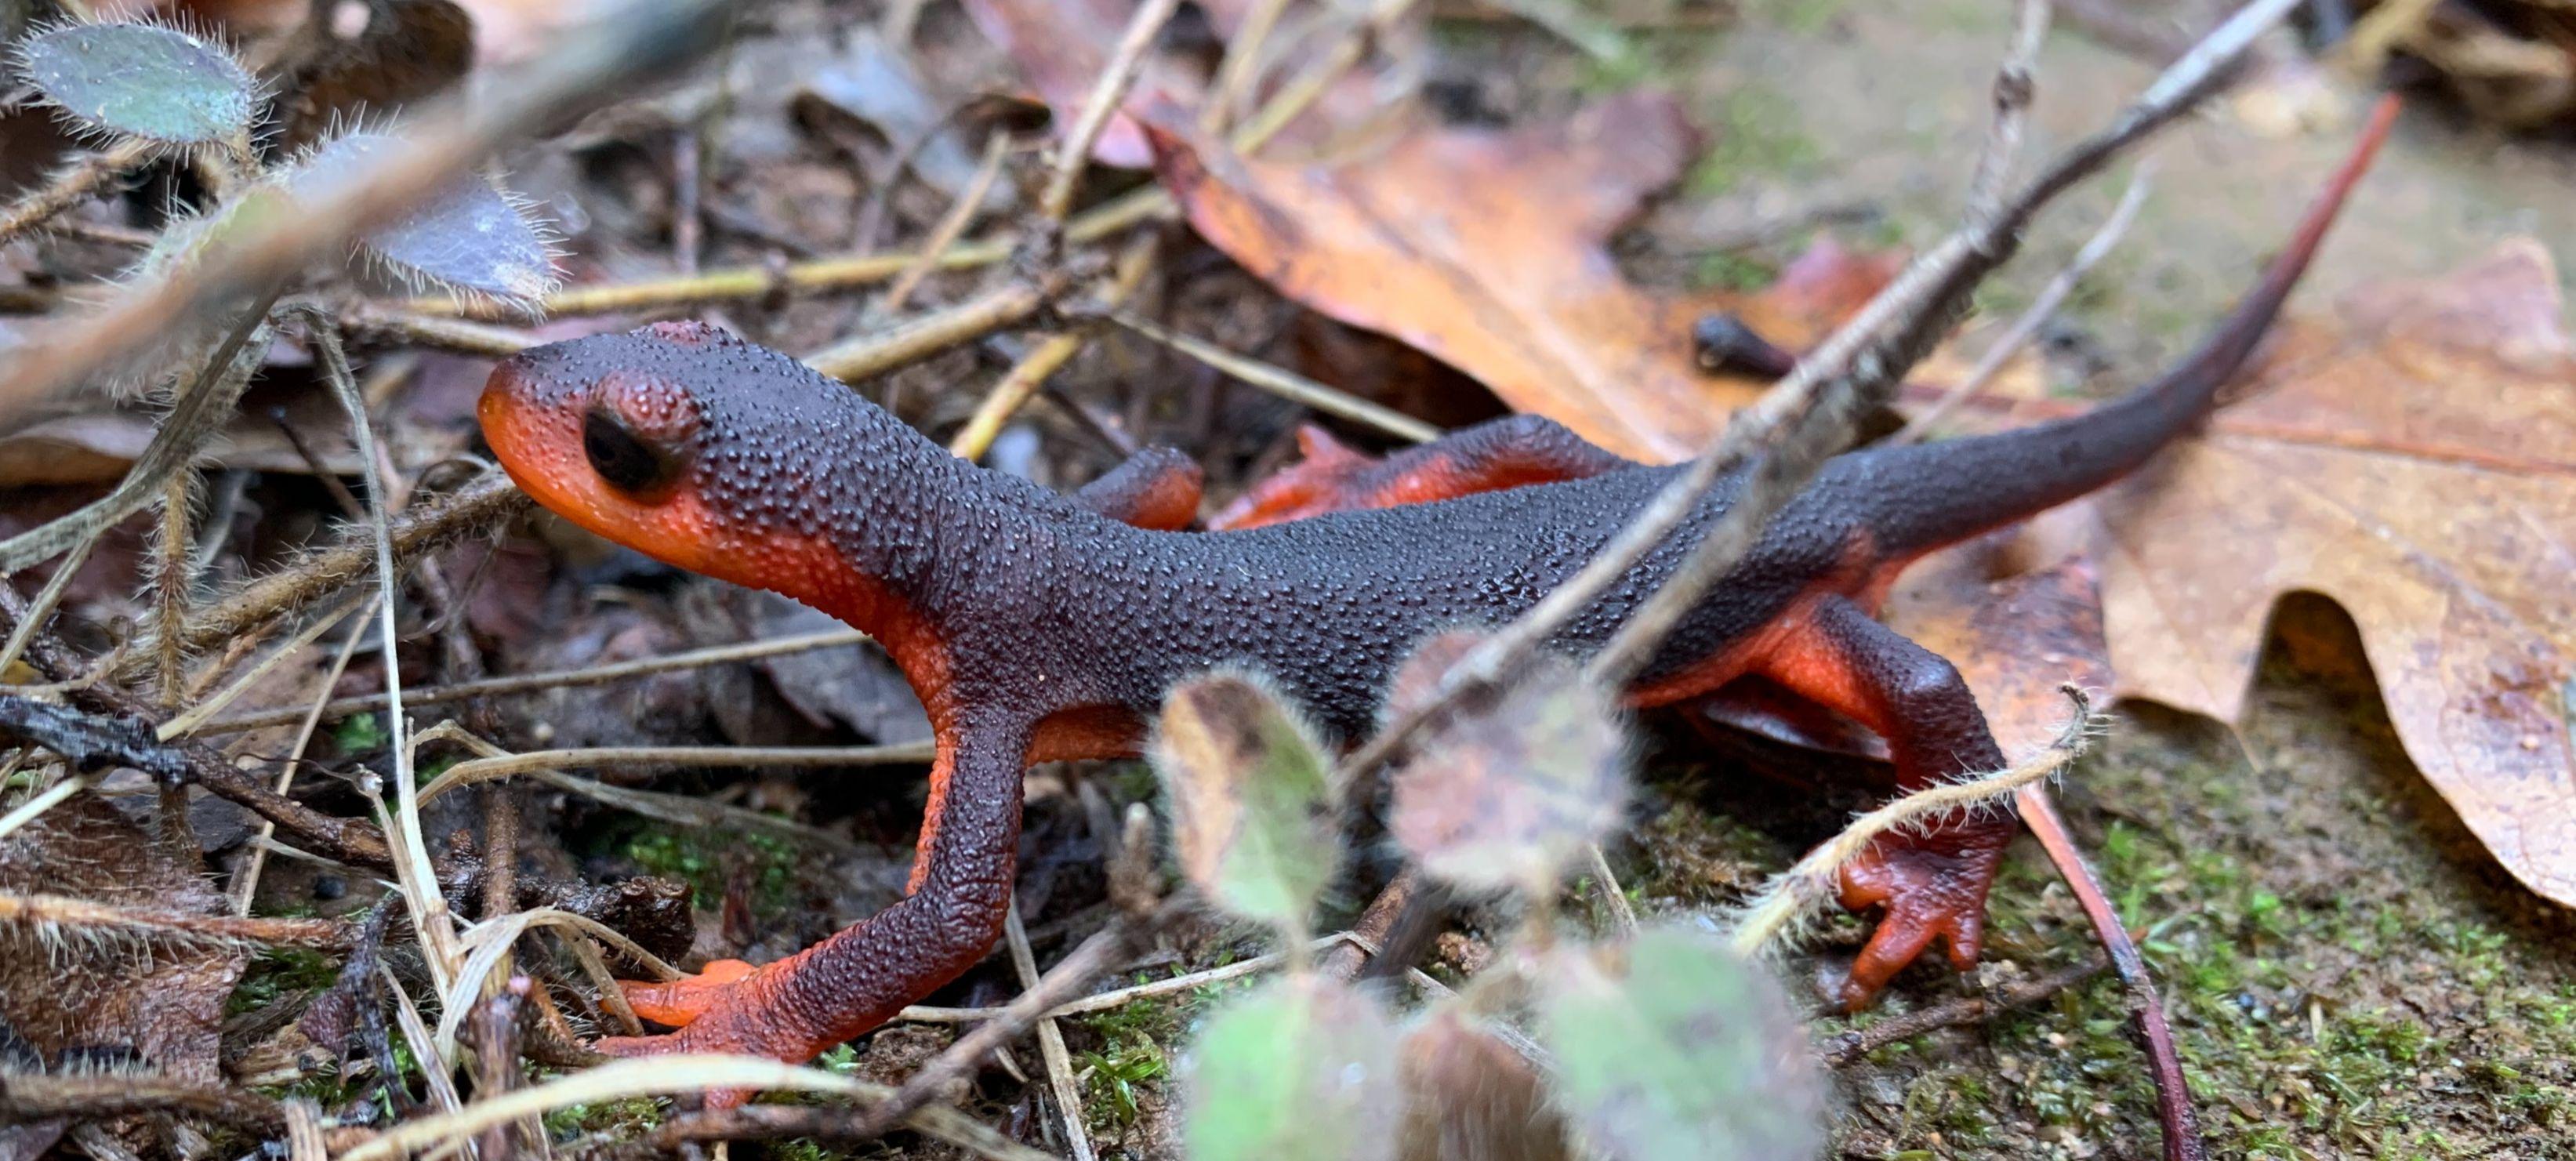 Red-bellied newt, Taricha rivularis